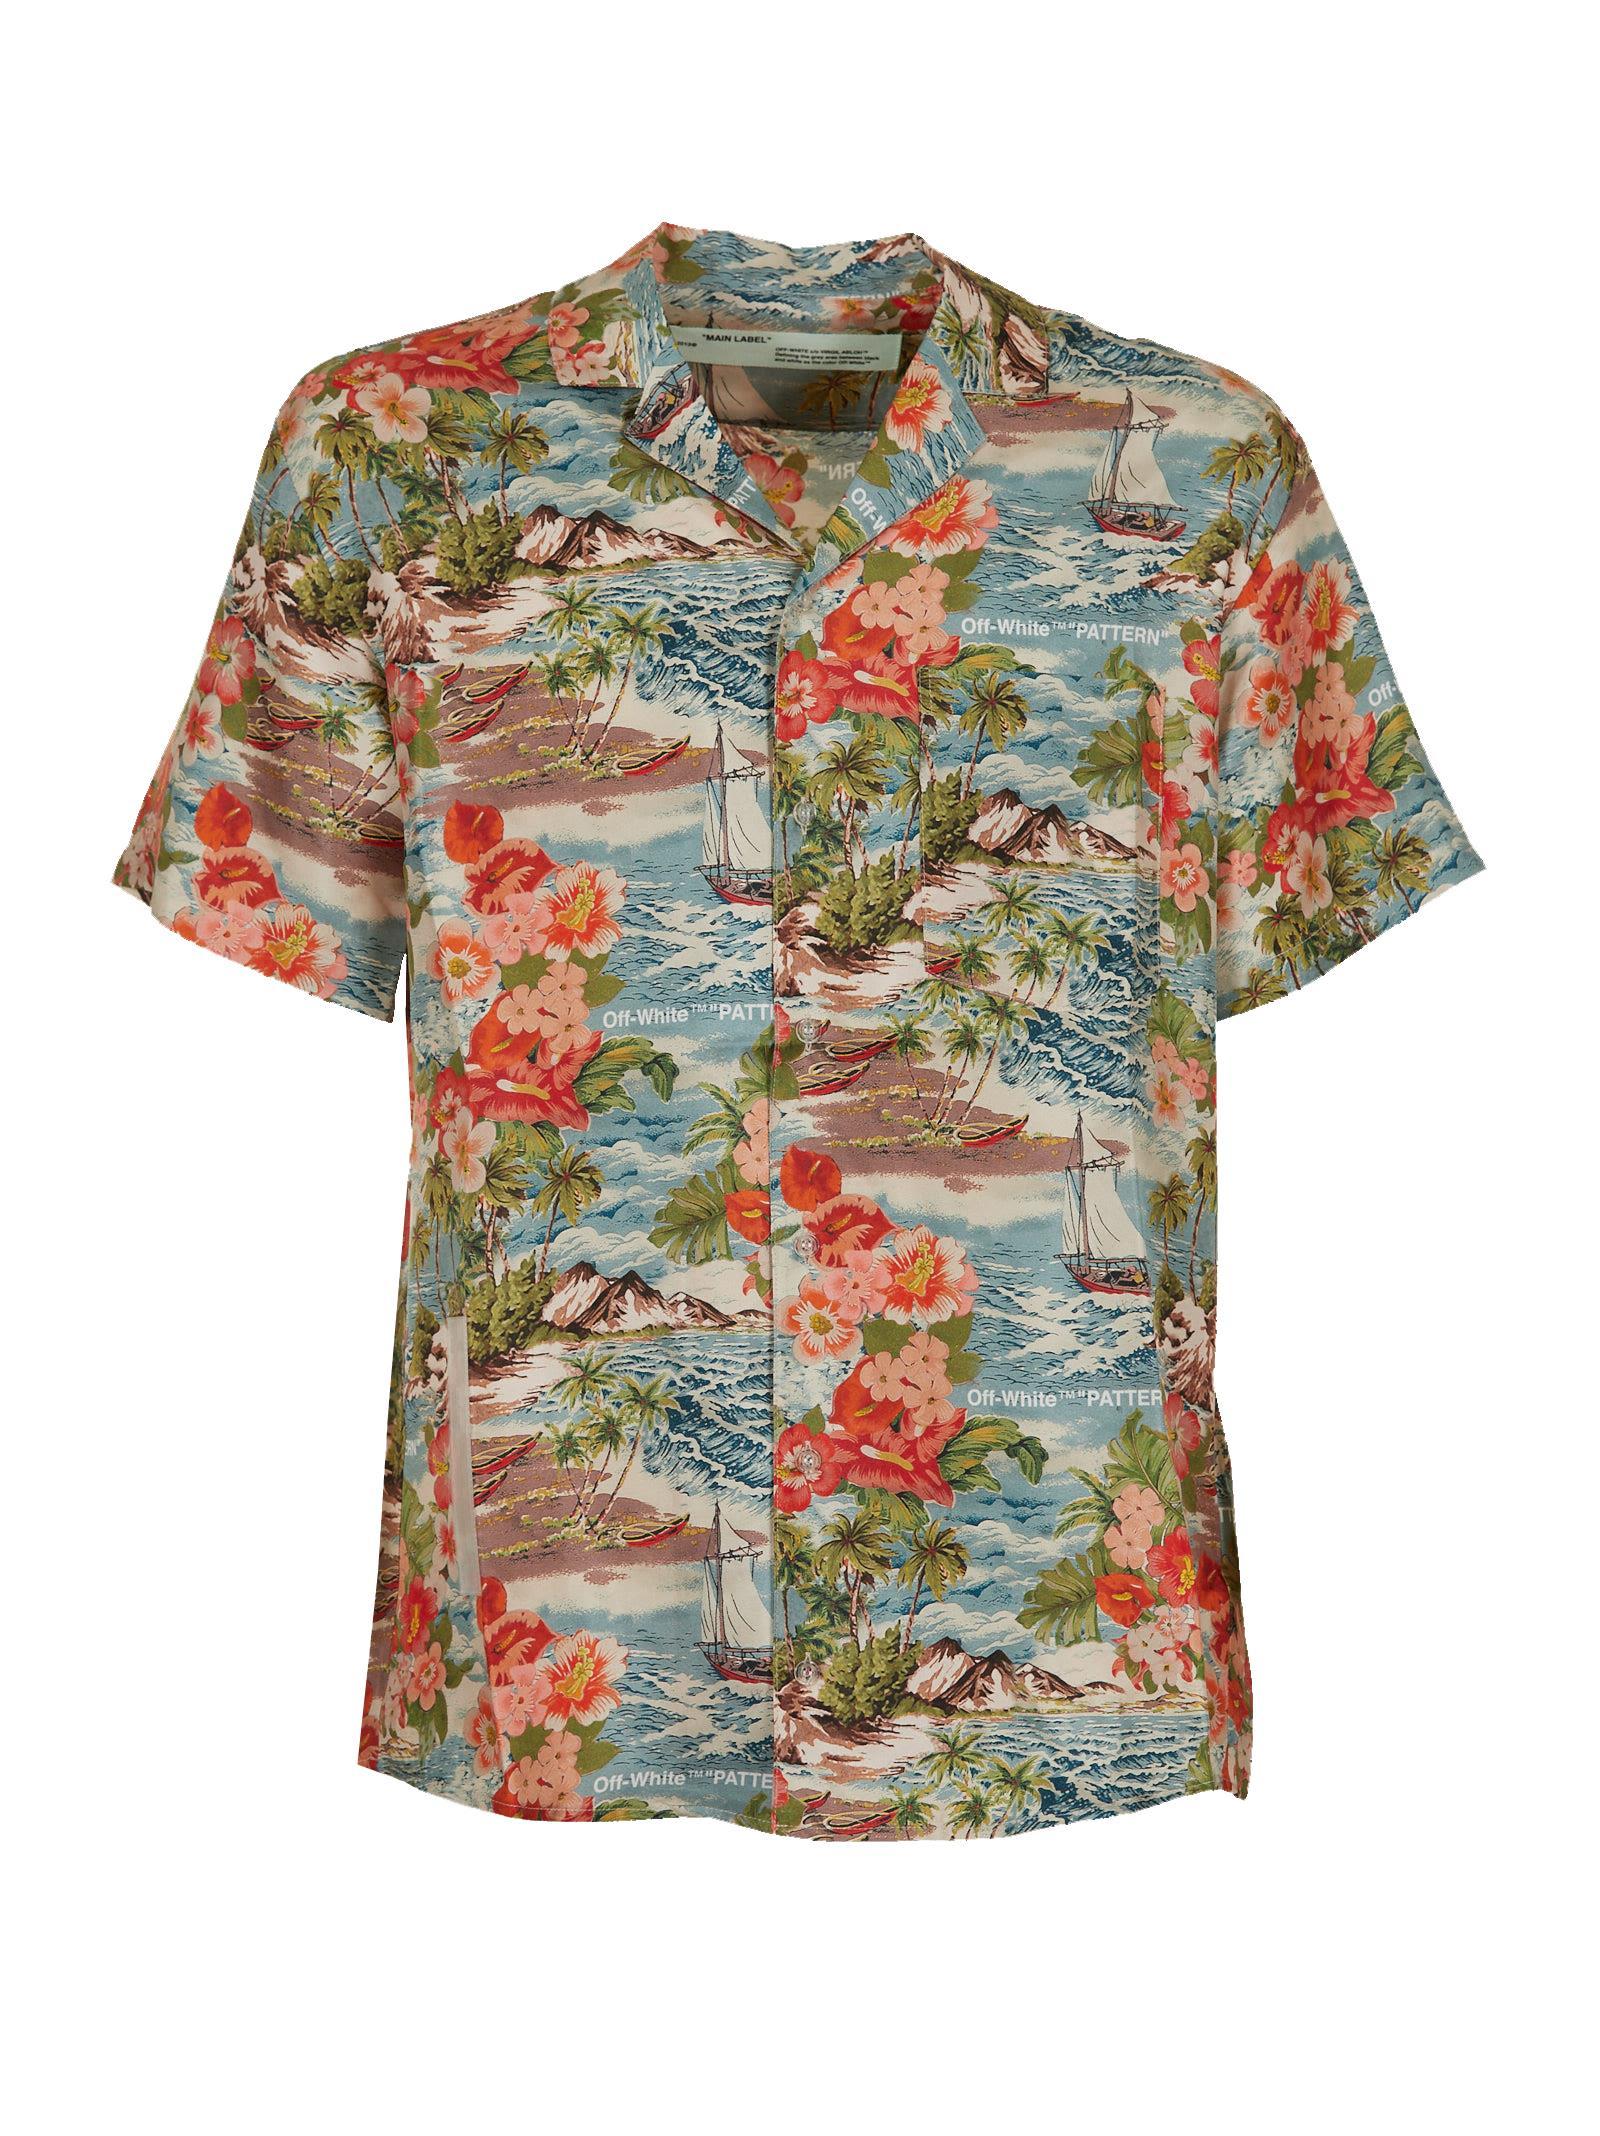 8a32d6c3c20 Hawaiian Shirts For Sale - The Latest Shirt Models 2018